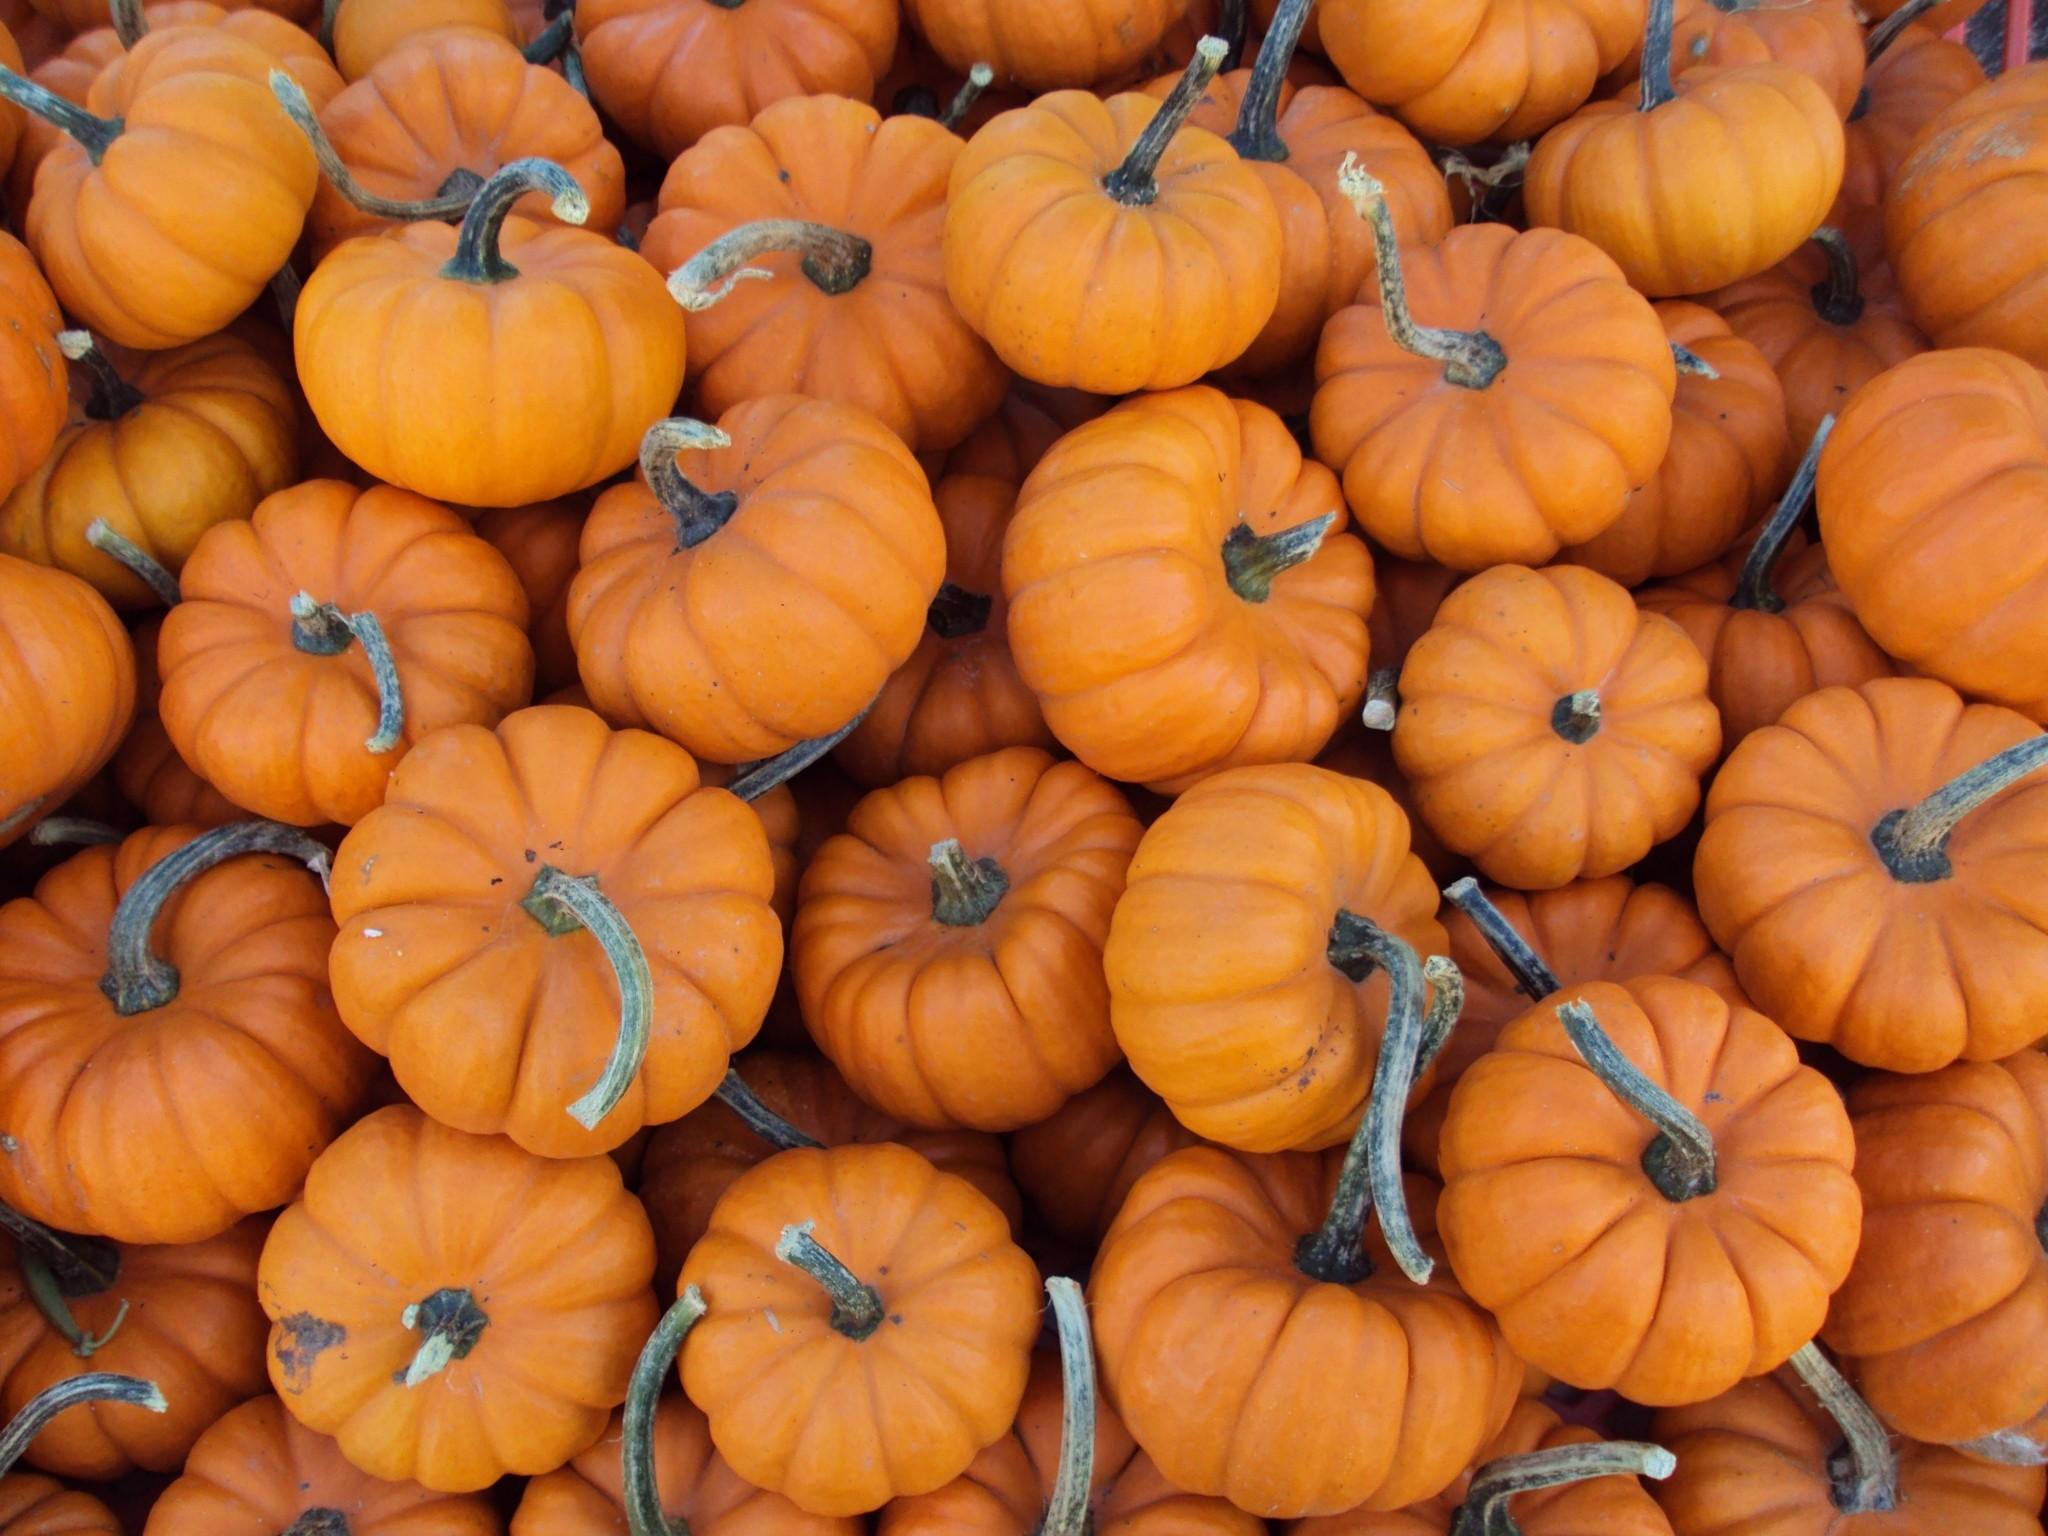 pumpkin backgrounds for desktop hd backgrounds